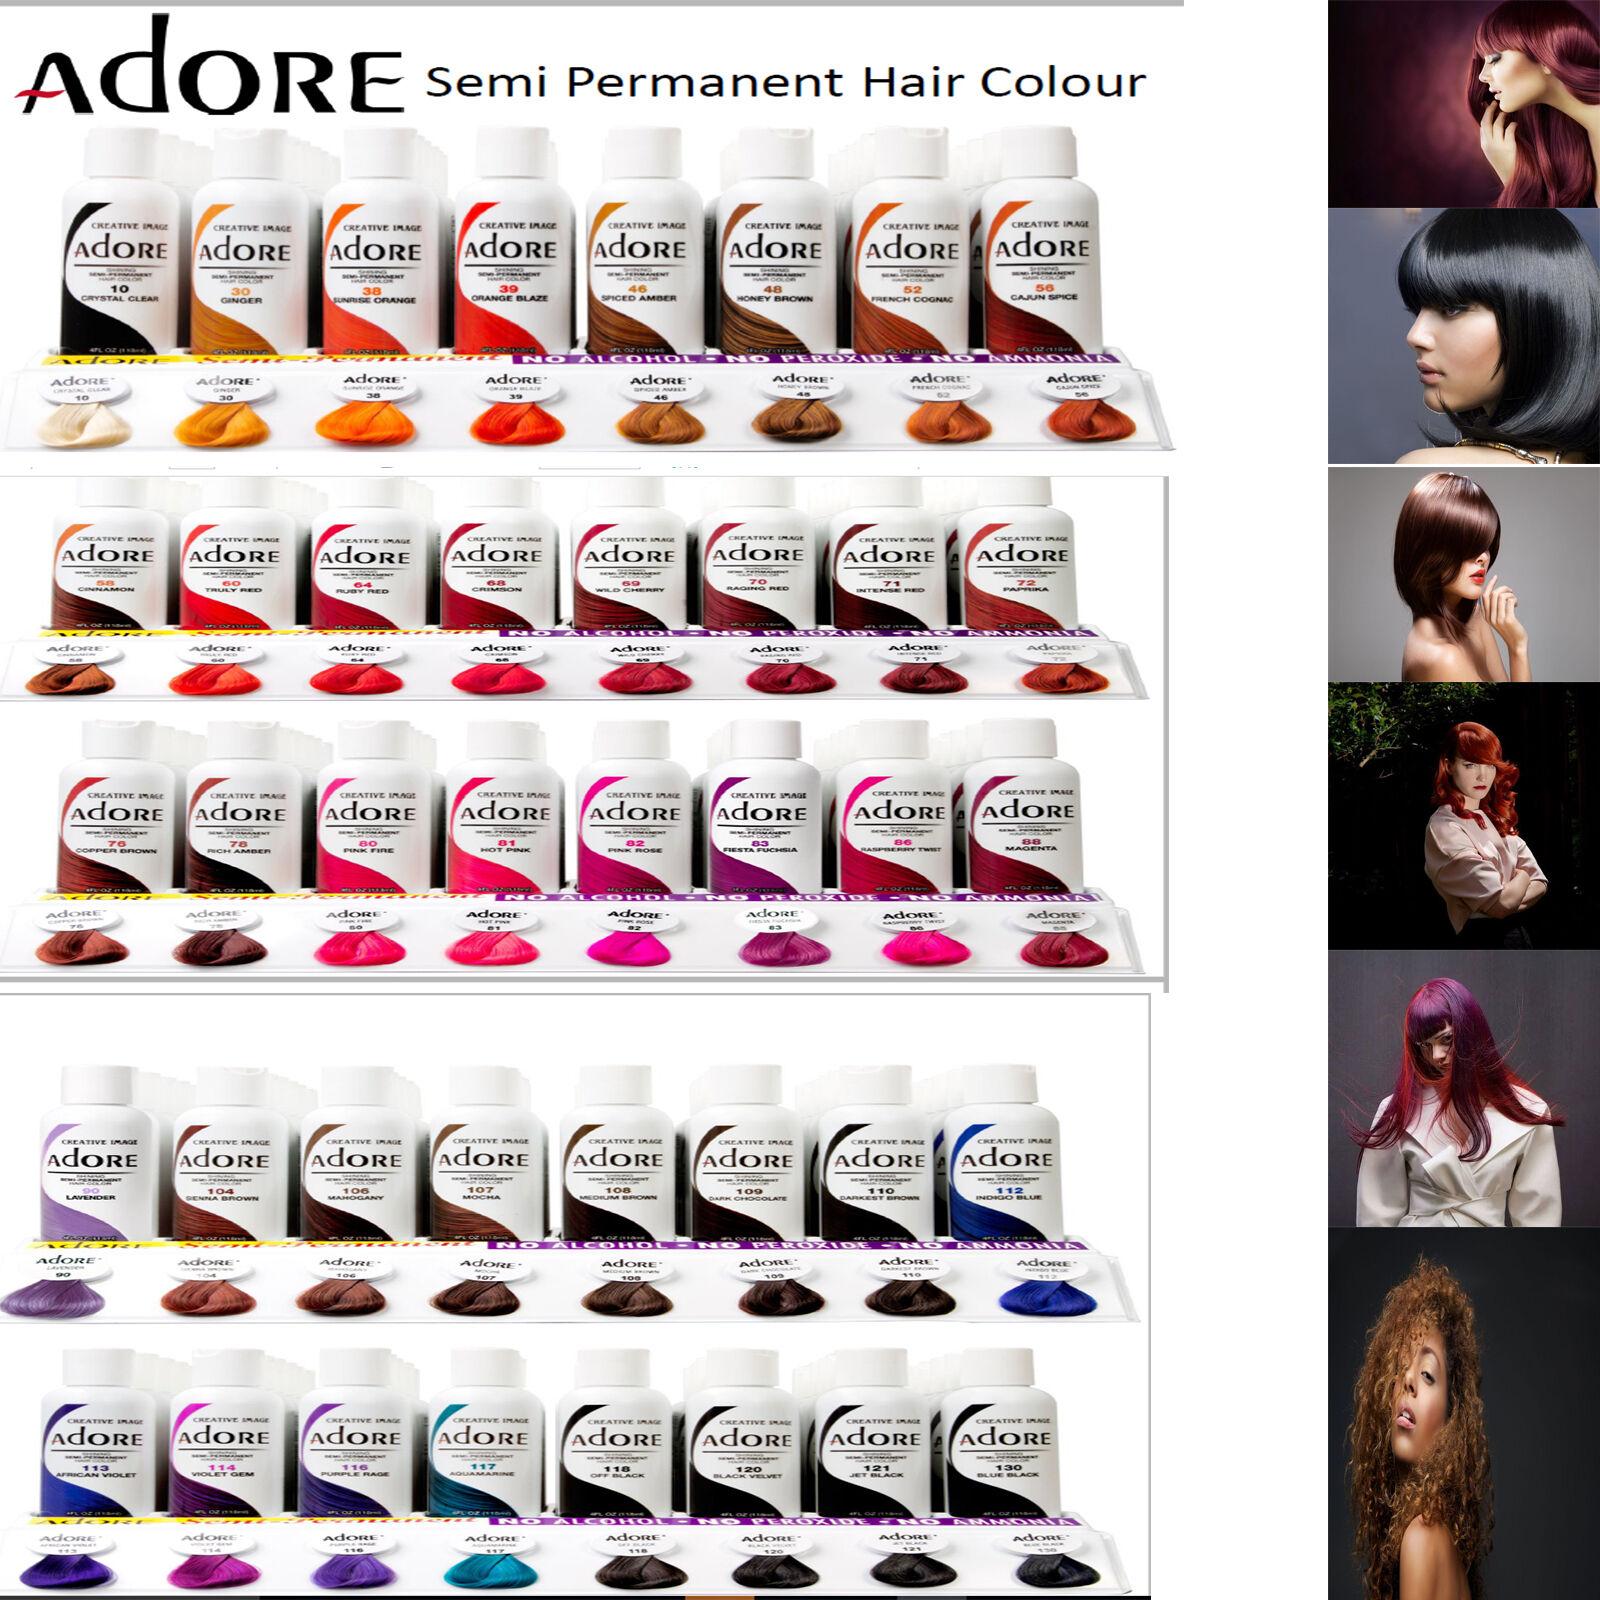 Adore Semi Permanent Hair Dye Colour Ammonia Peroxide Alcohol Free